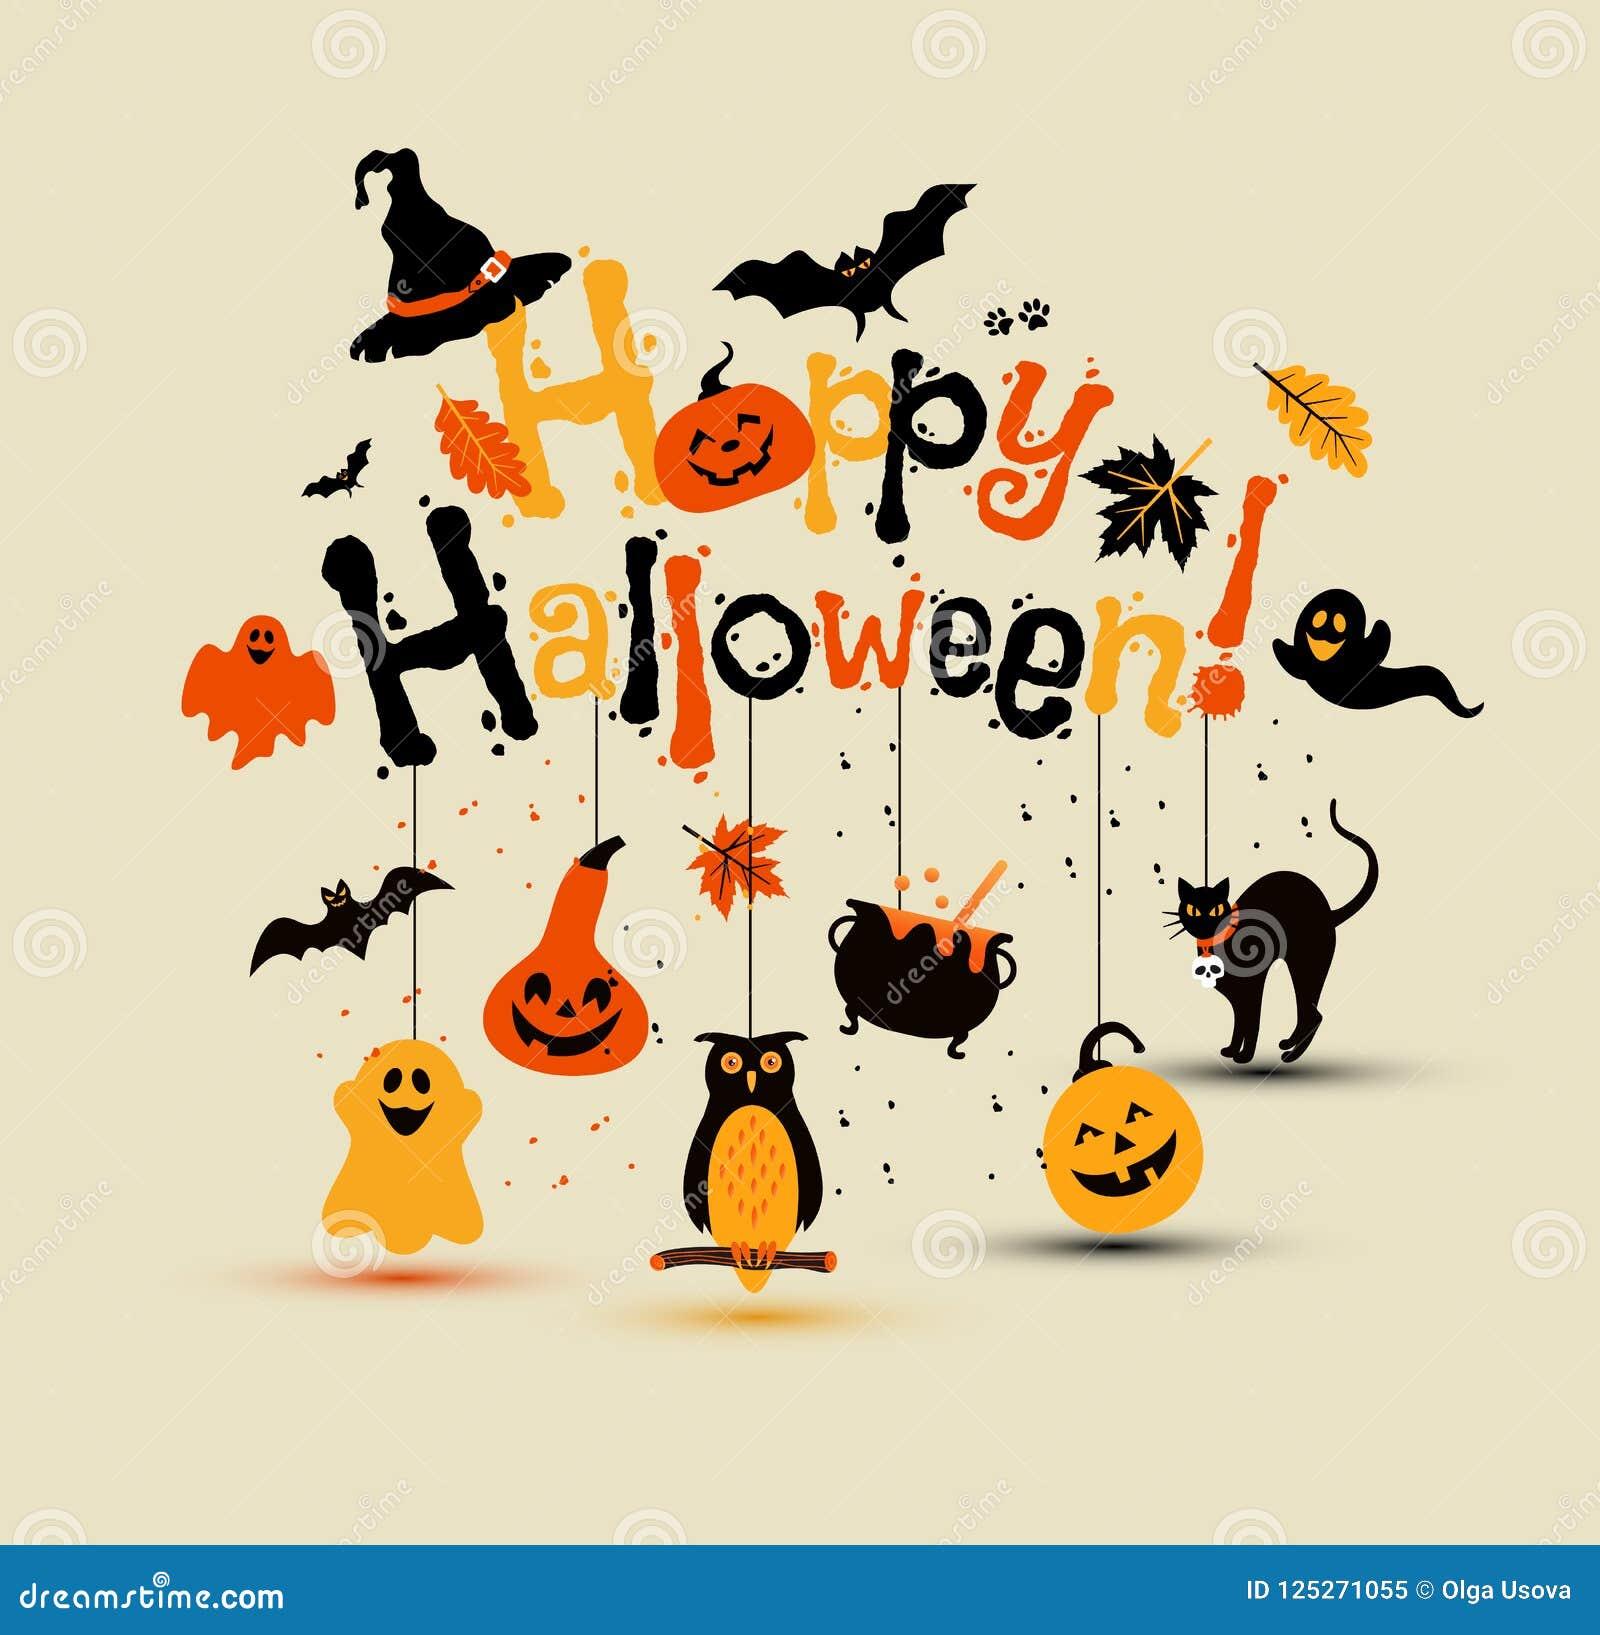 Halloween Vector Design With Happy Halloween Lettering Stock Vector Illustration Of Fall Dark 125271055